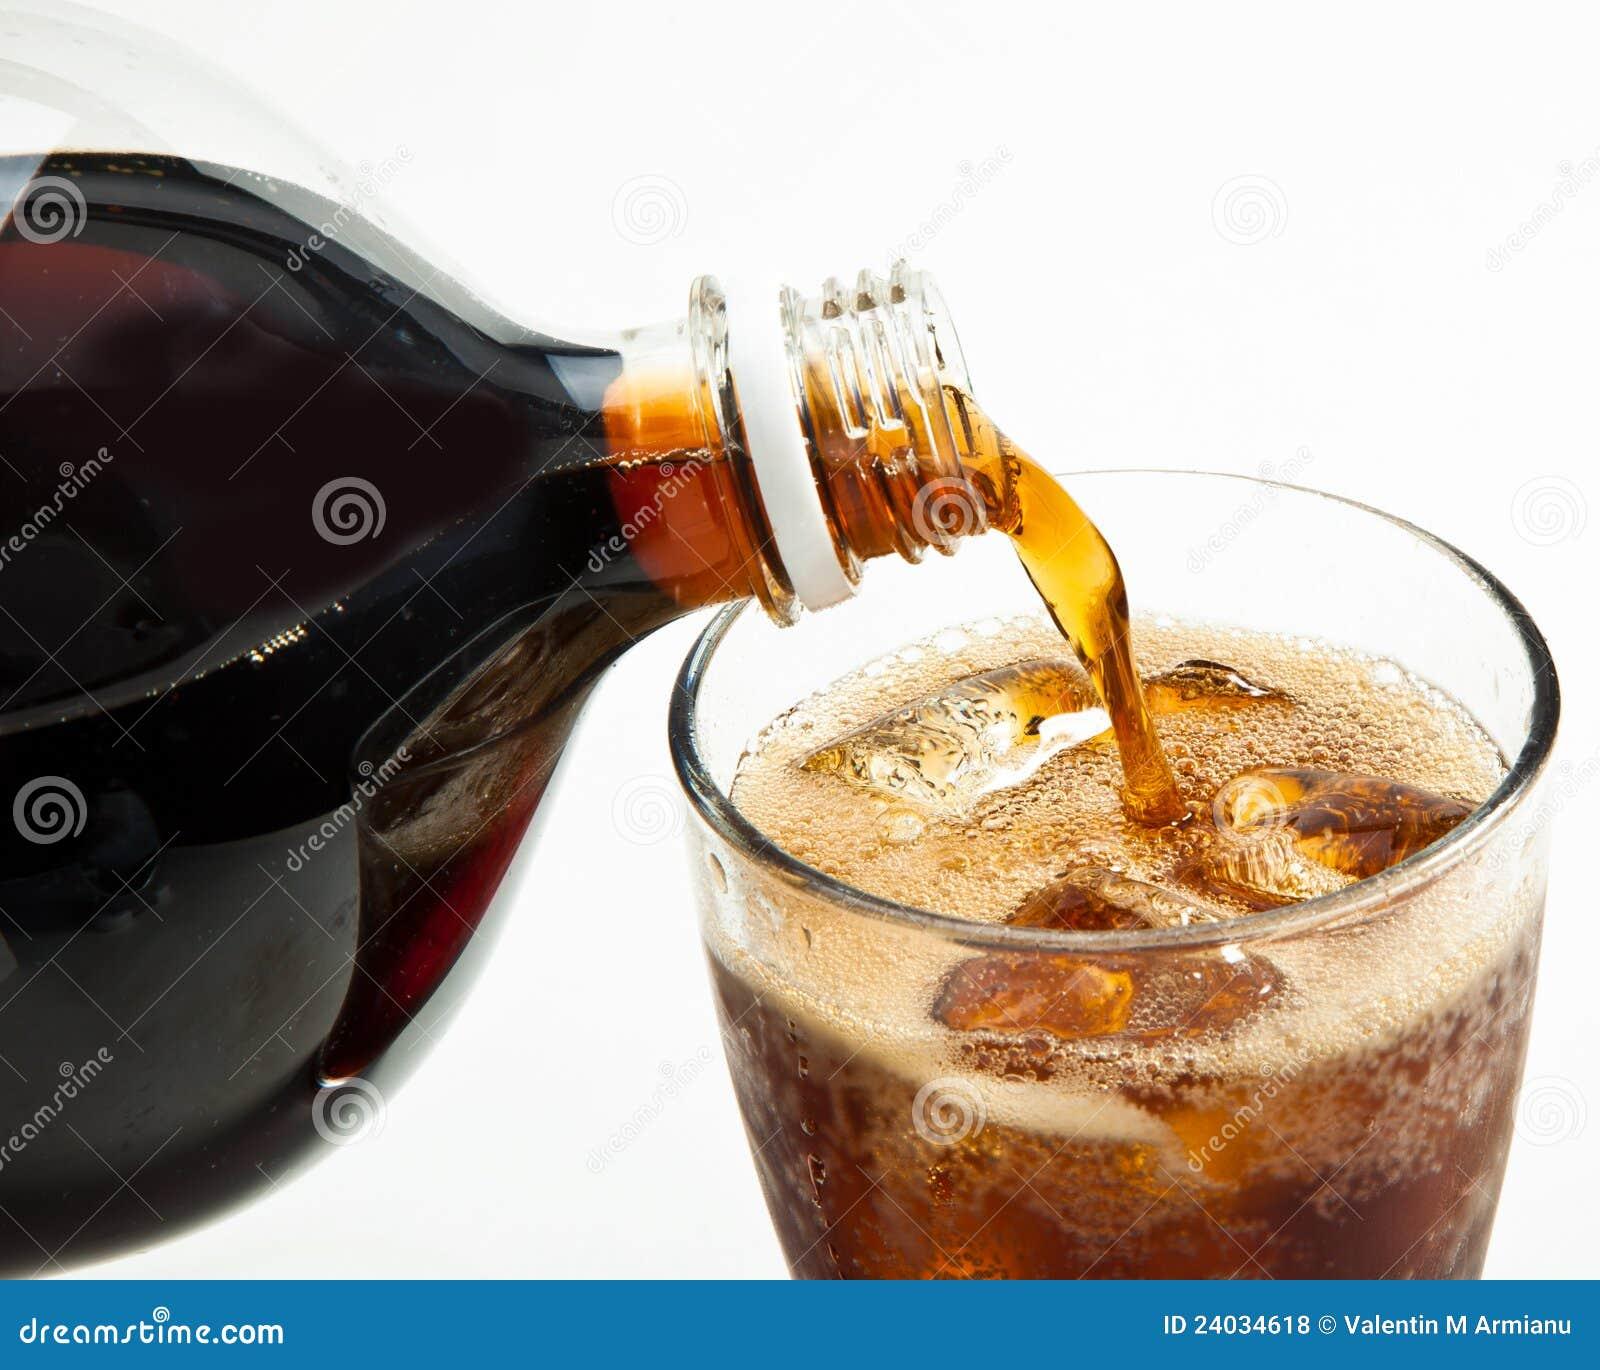 Pouring Soda